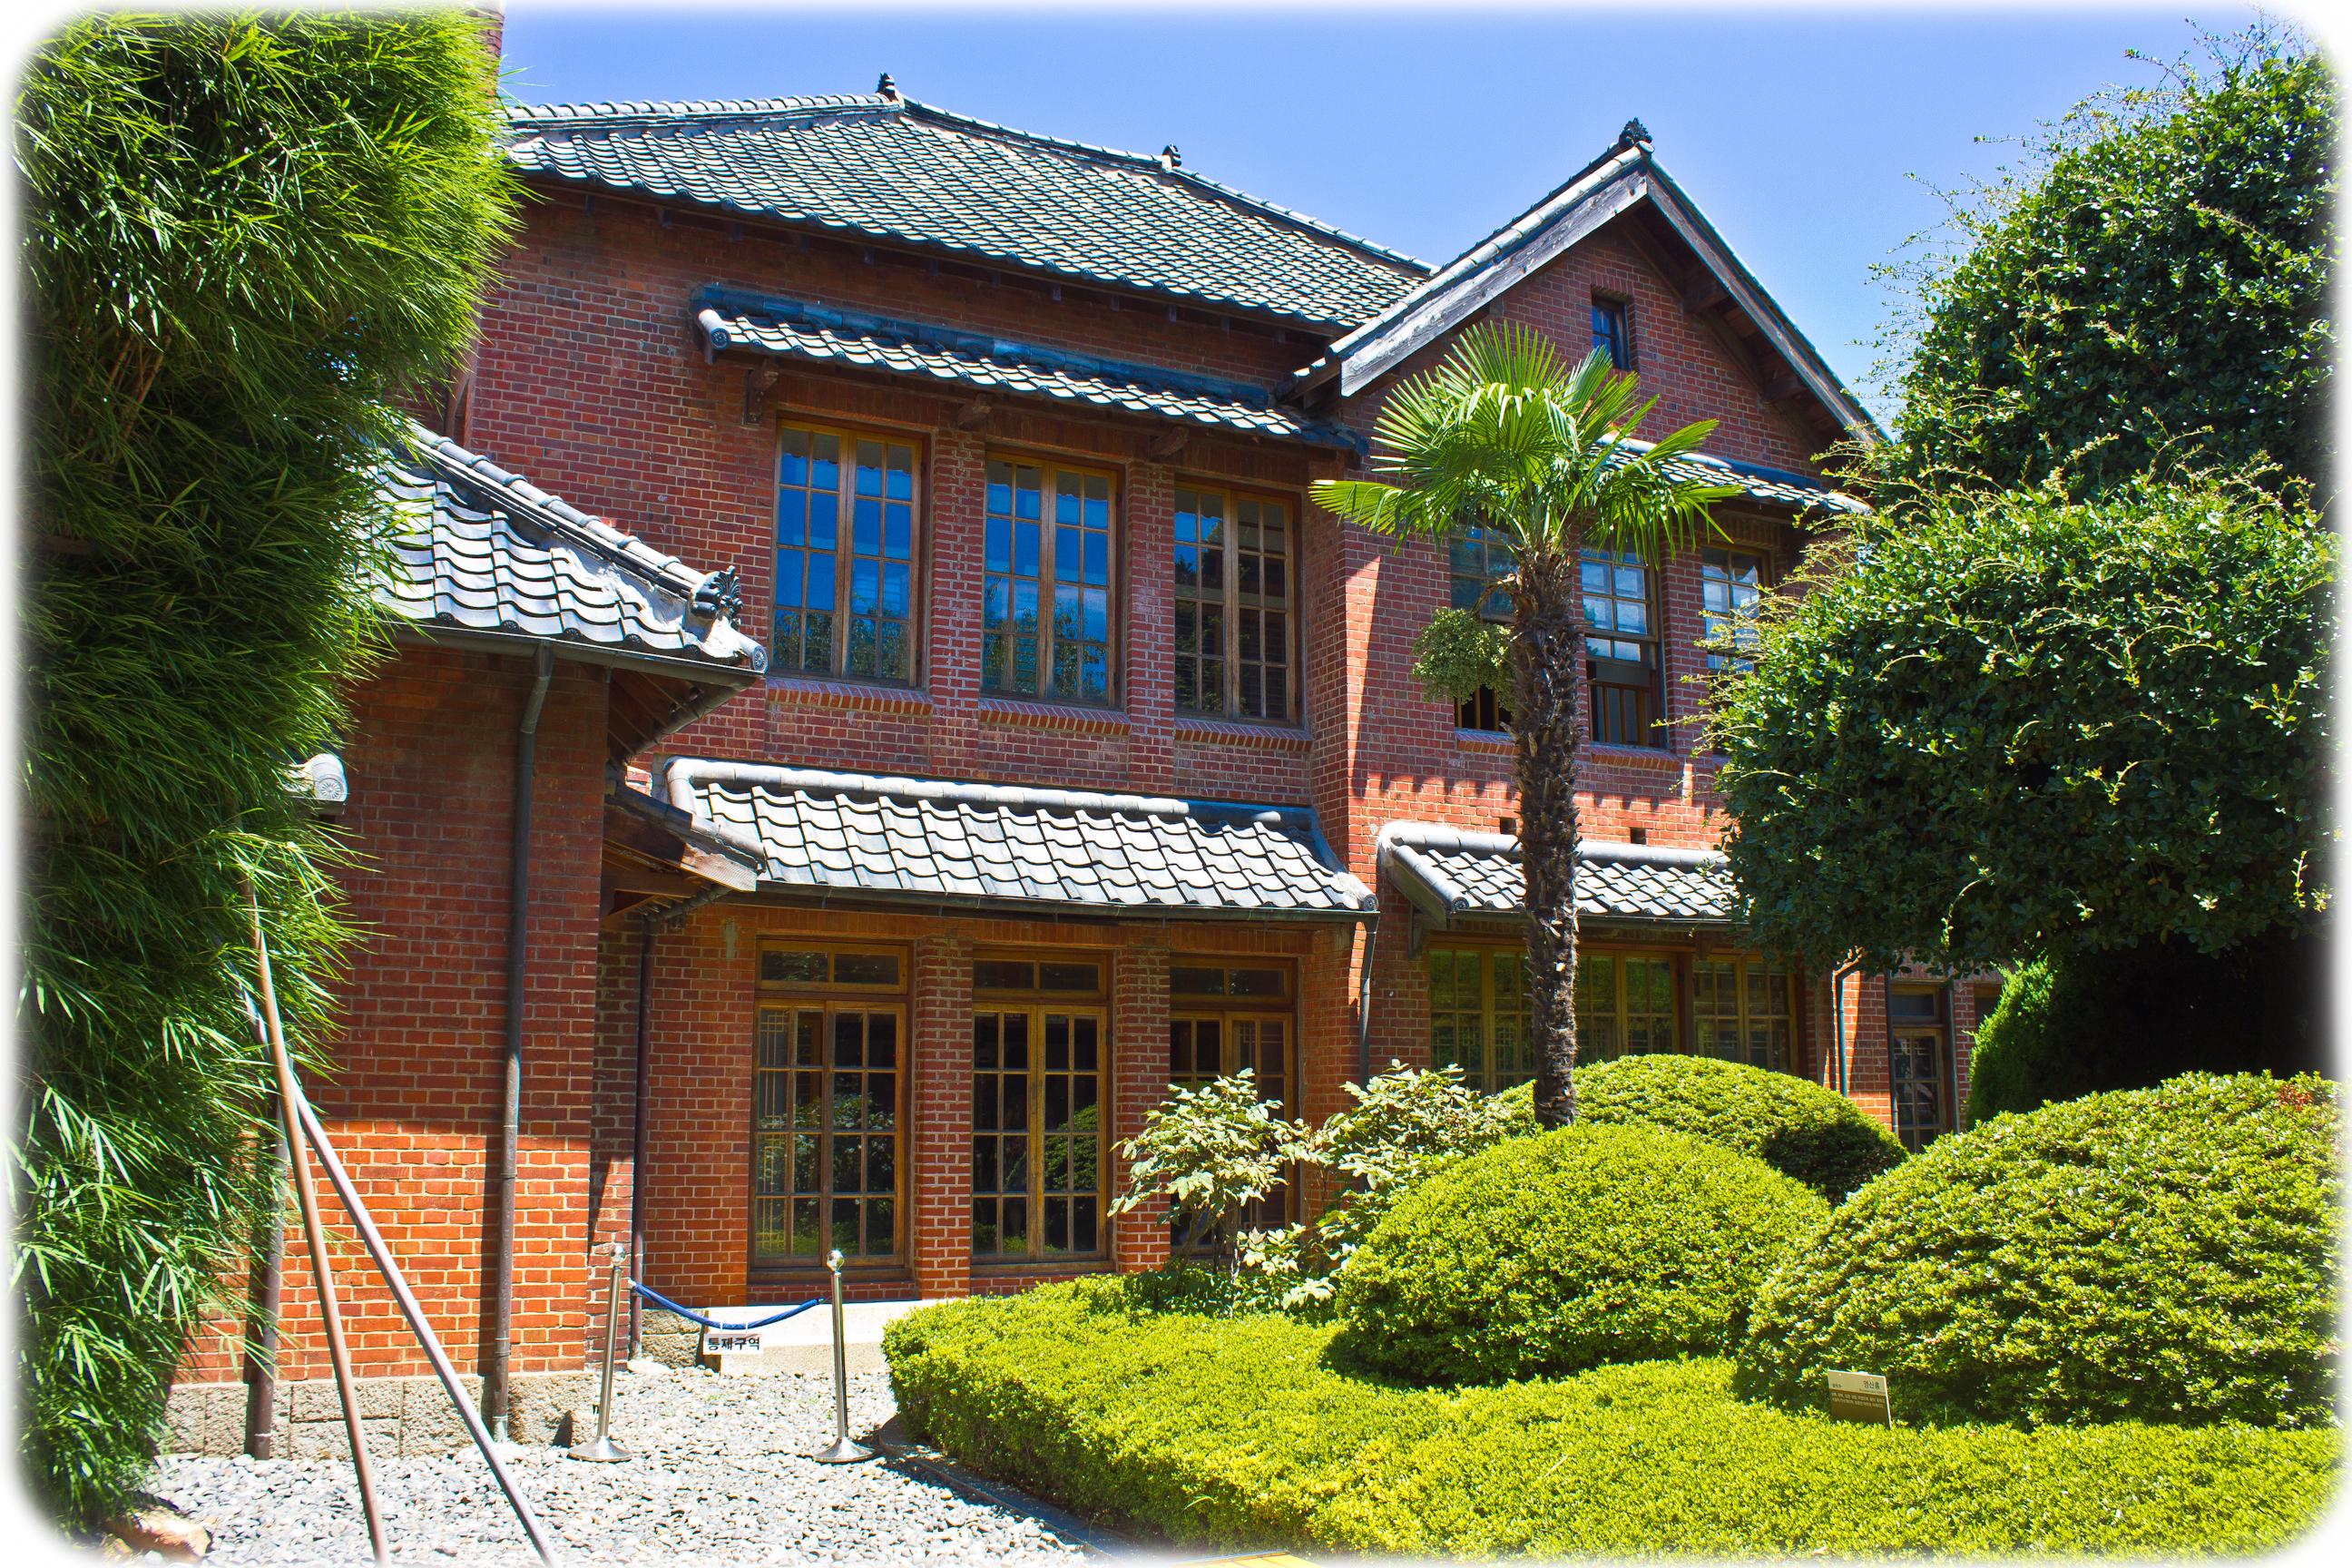 Busan 4 colonial korea - Mansions in south korea ...